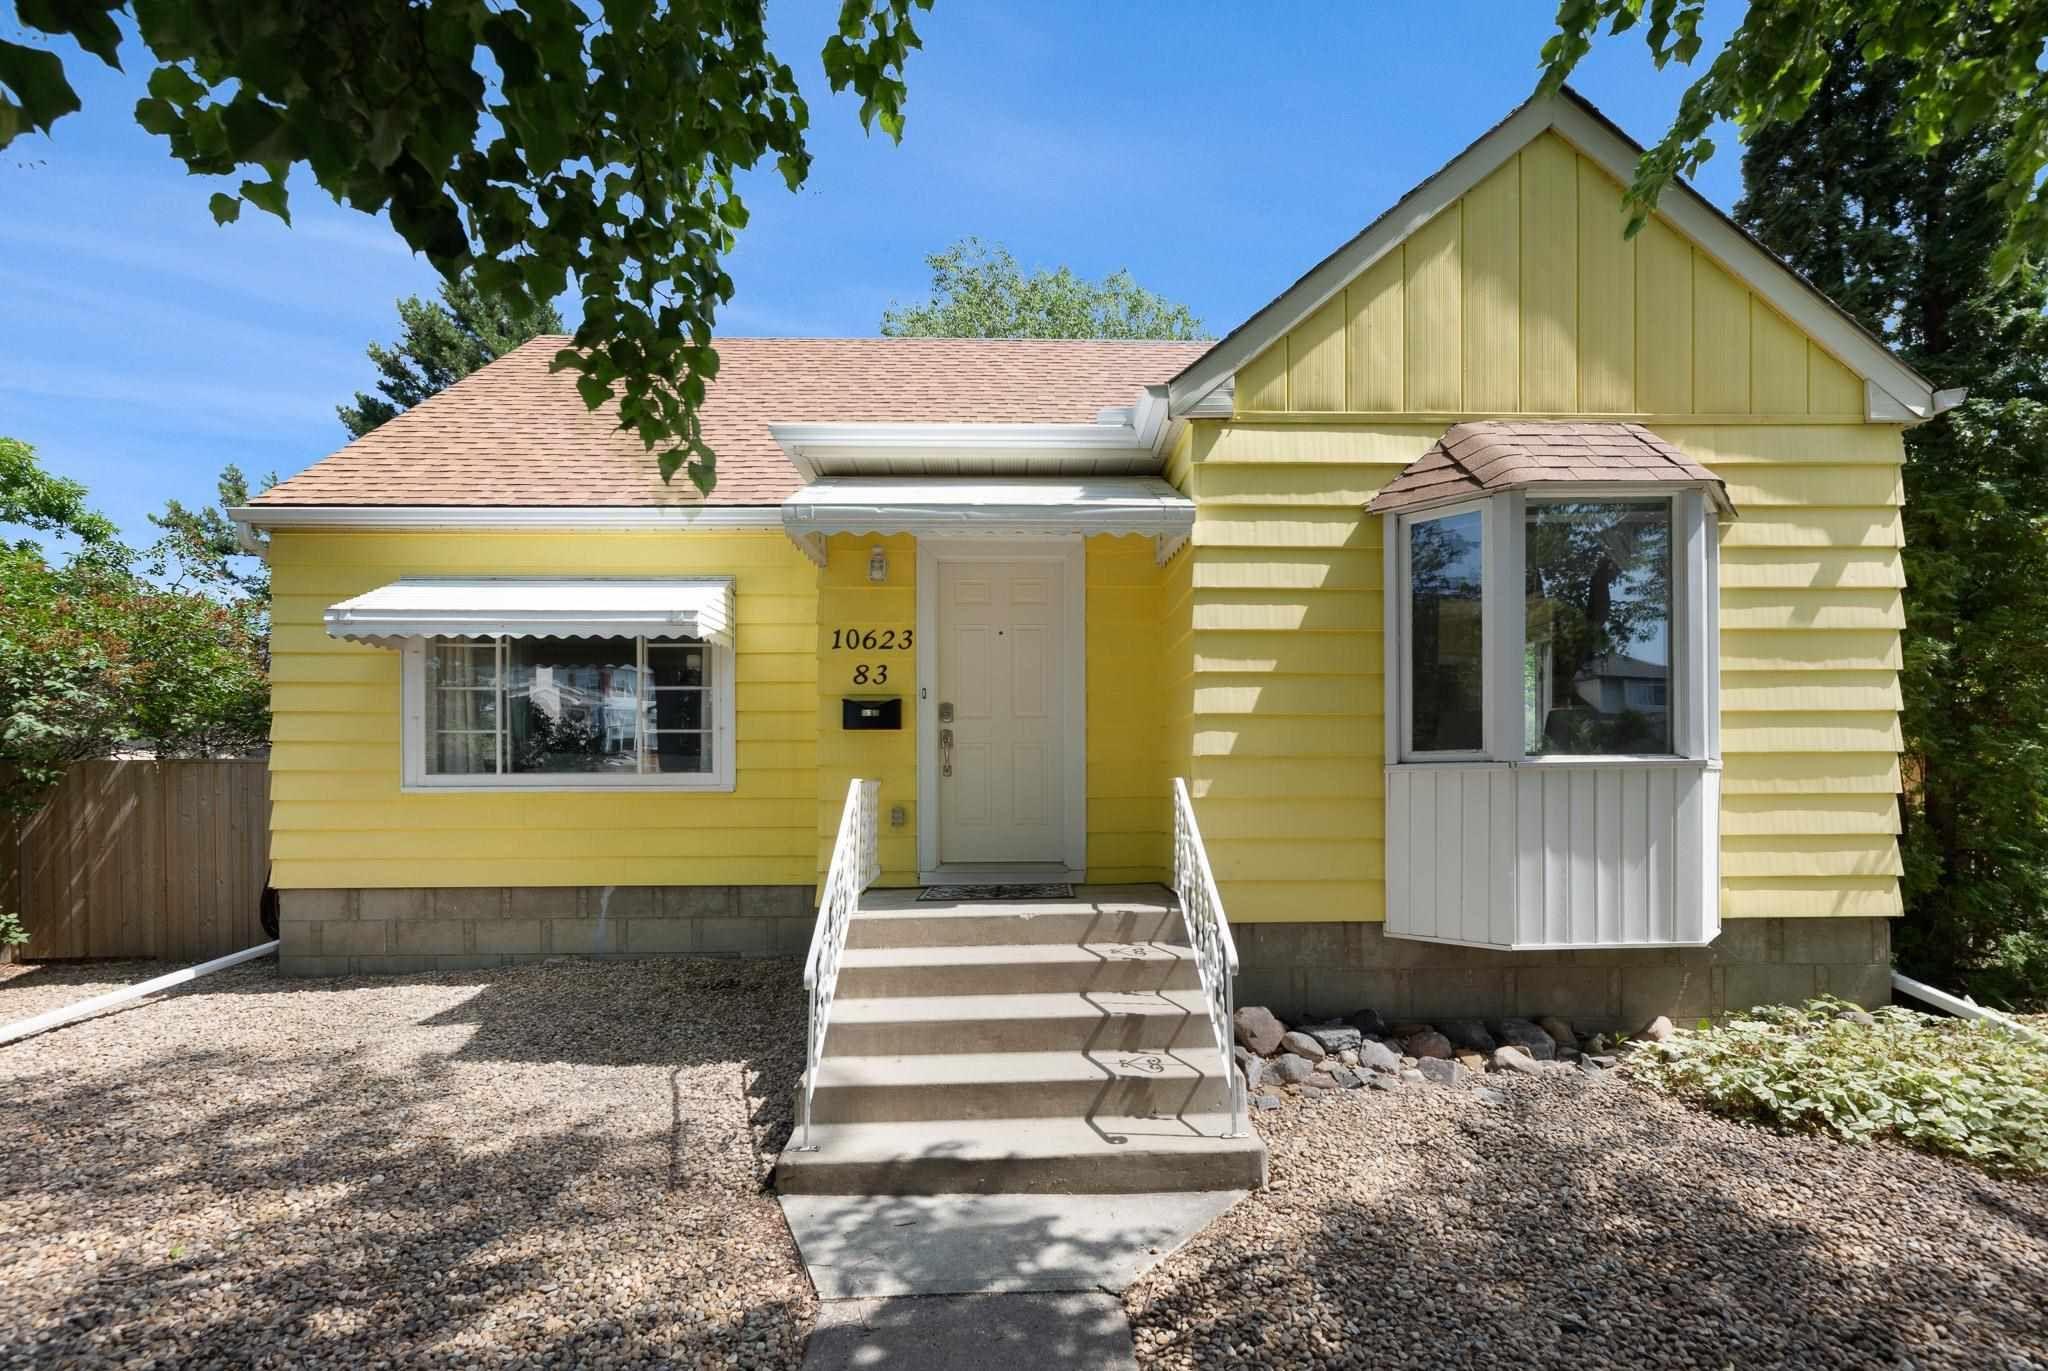 Main Photo: 10623 83 Street in Edmonton: Zone 19 House for sale : MLS®# E4253859